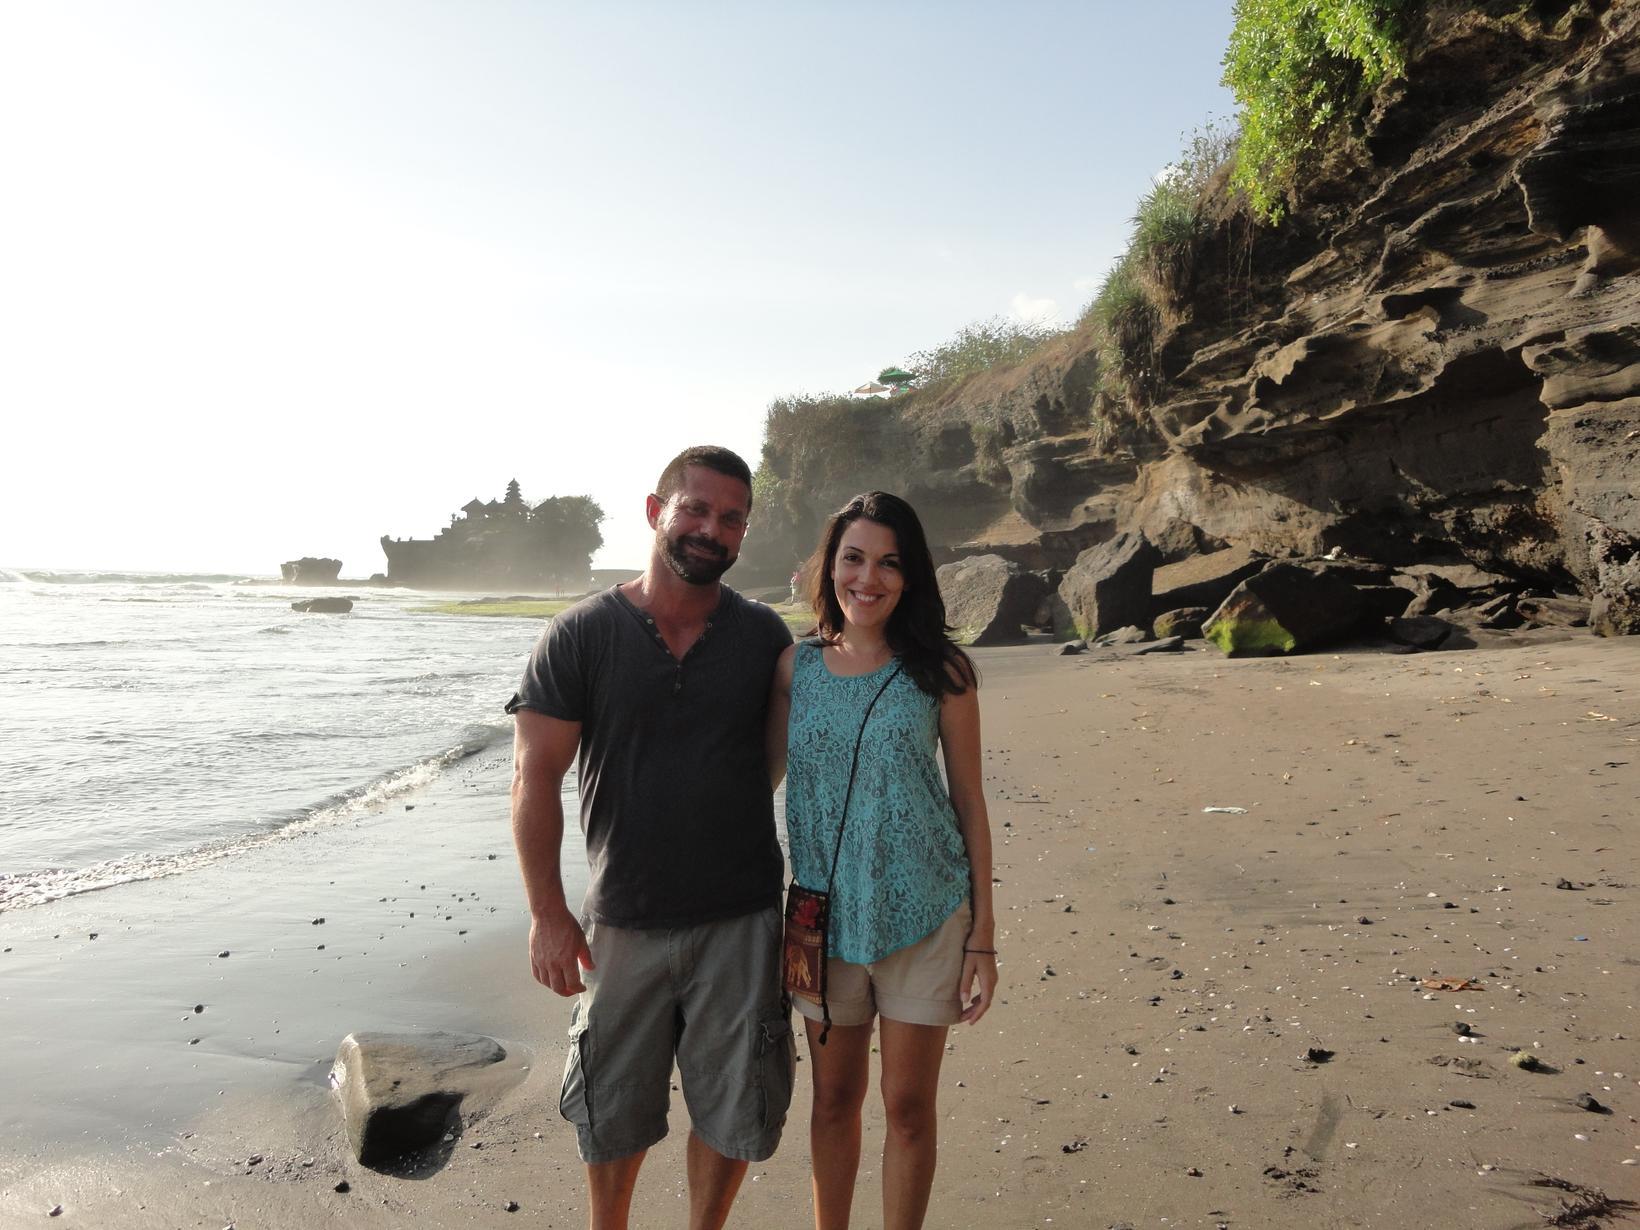 Lidia & Robert from Abu Dhabi, United Arab Emirates